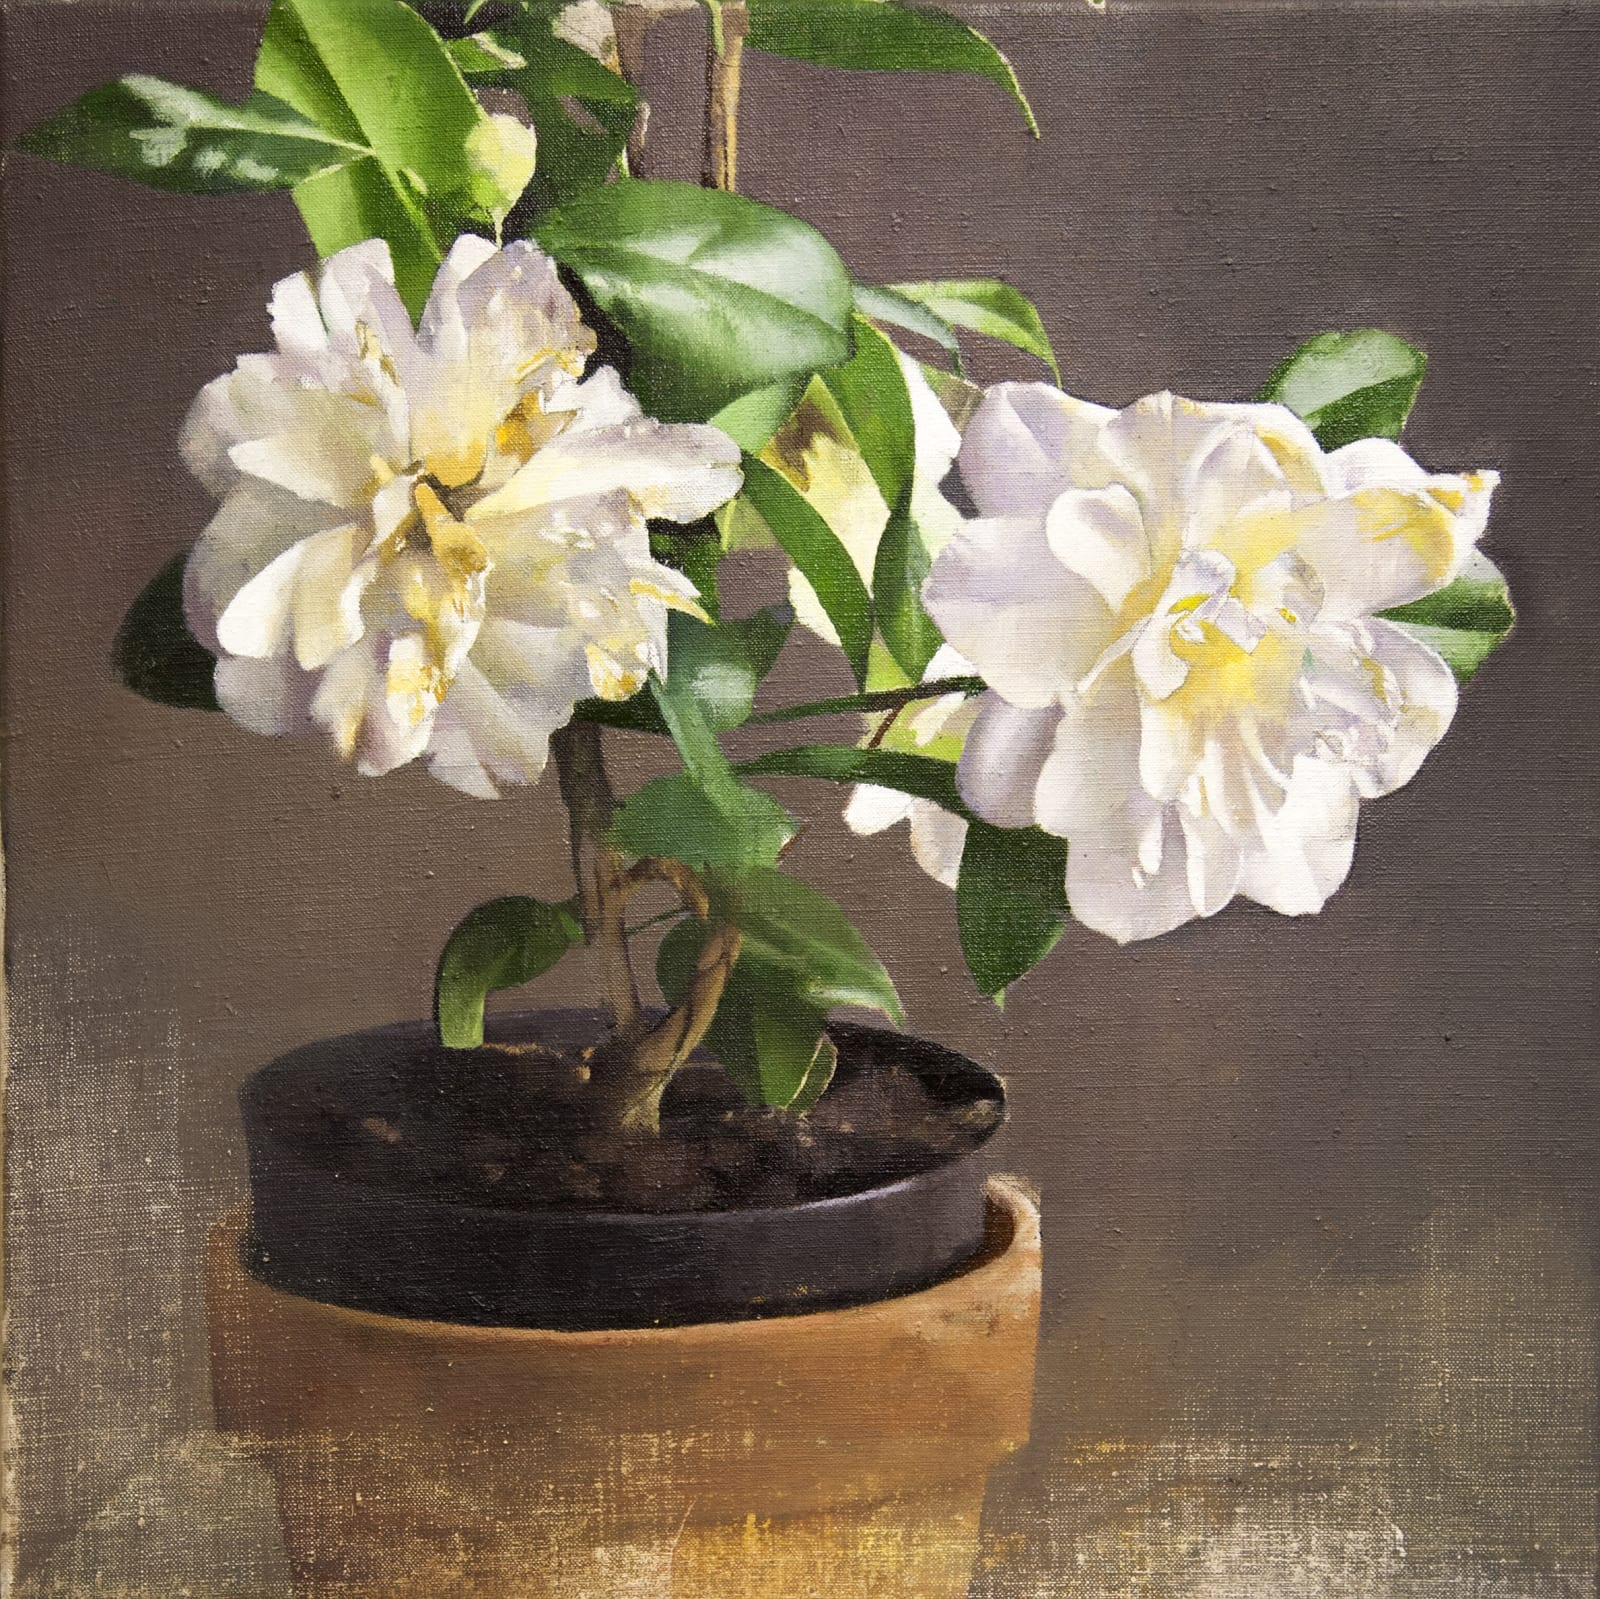 Diarmuid Kelley, Camellias, 2017